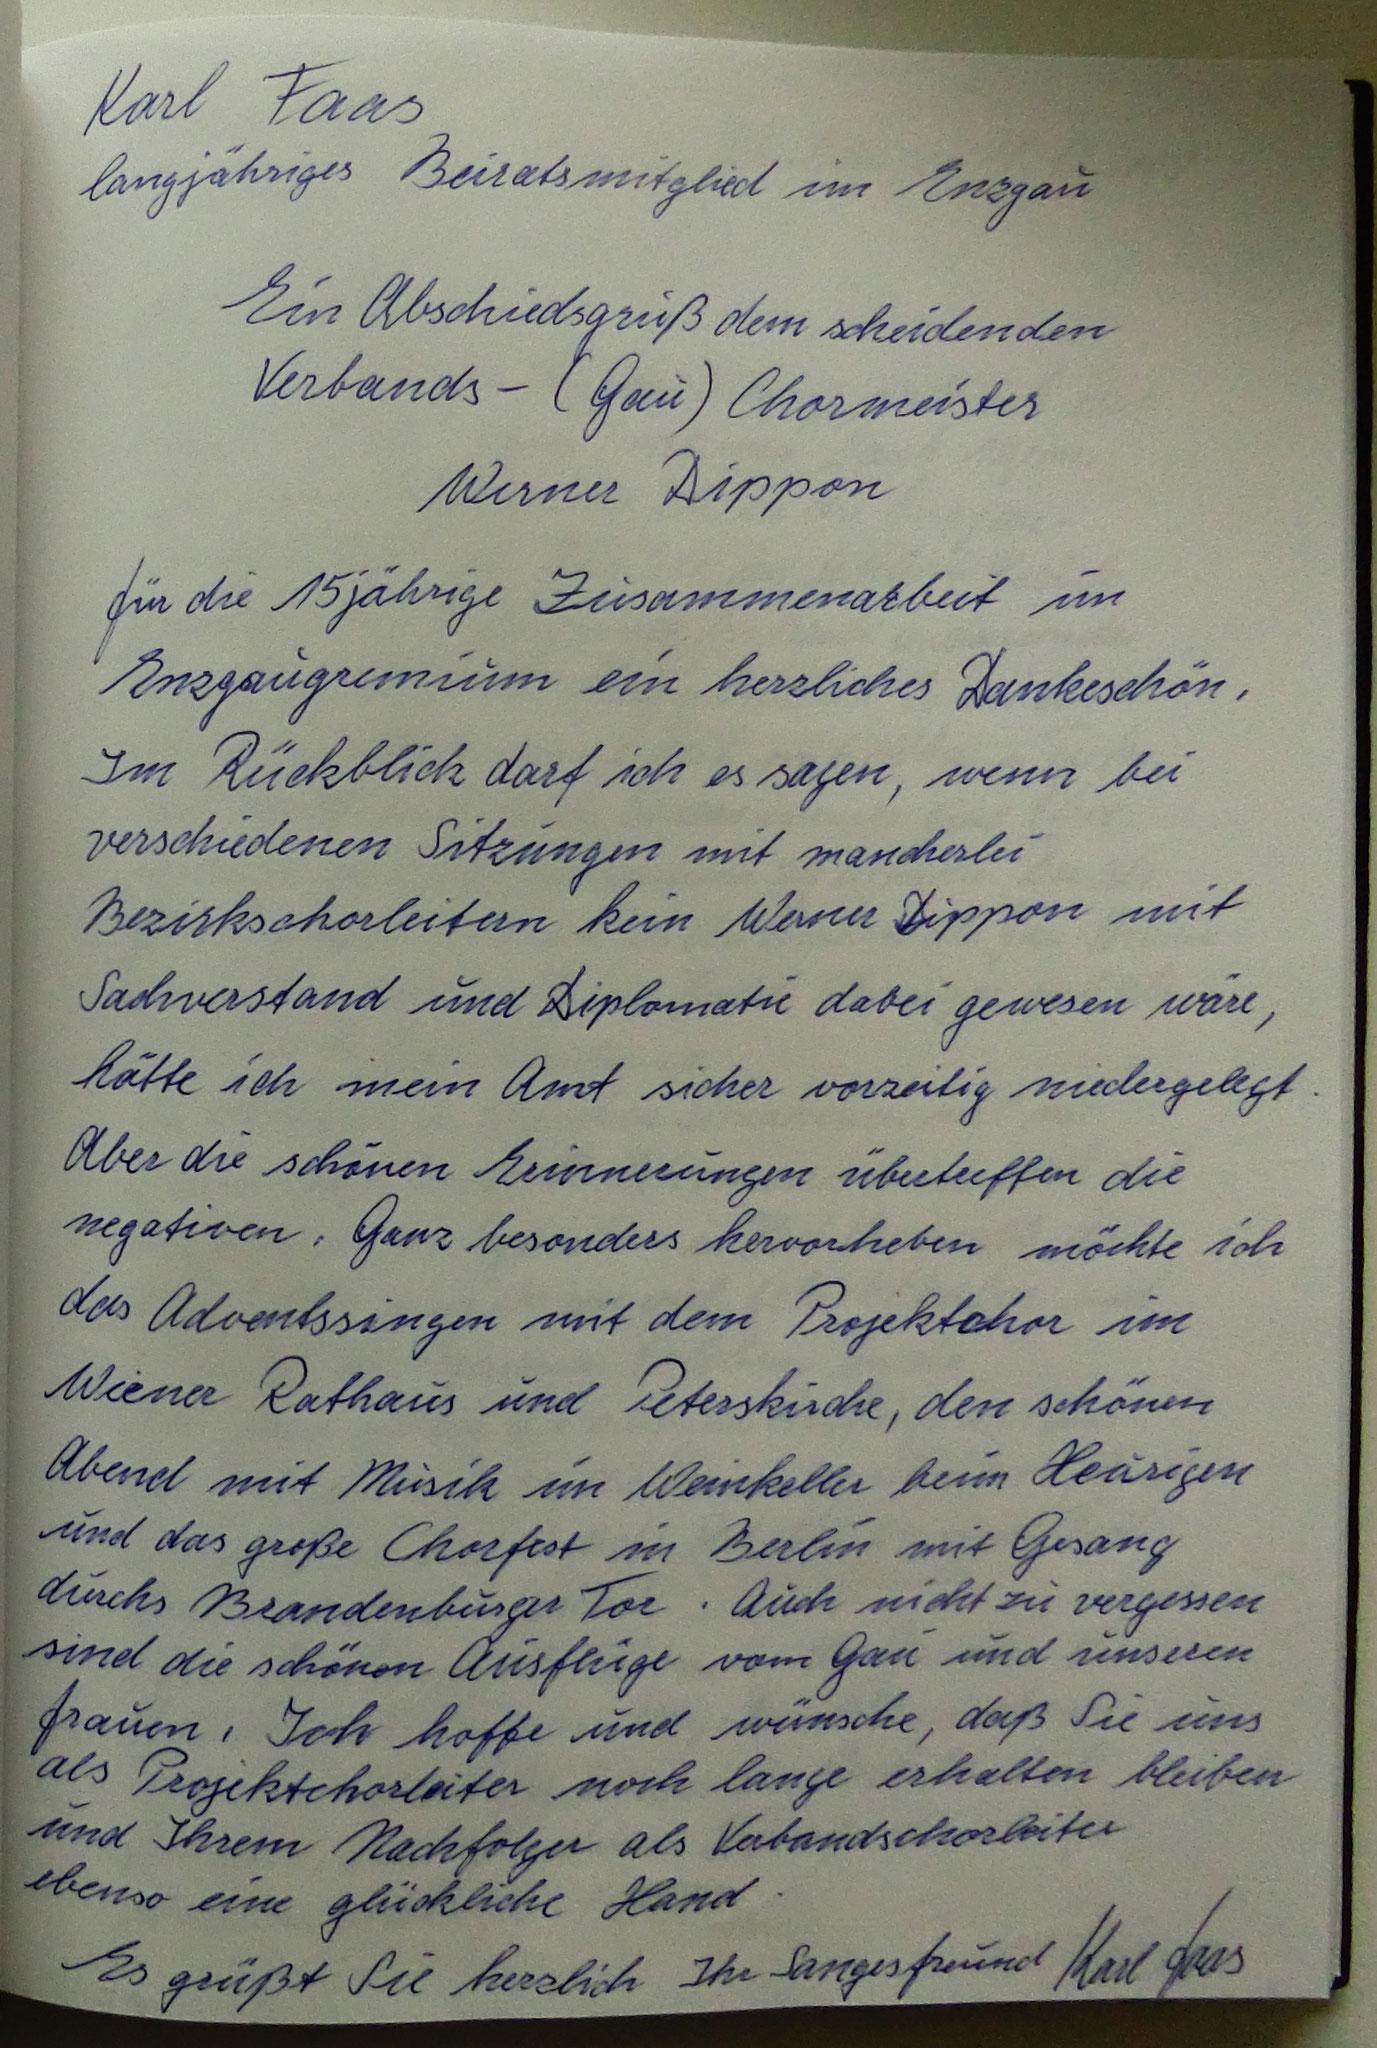 Karl Faß - Iptingen